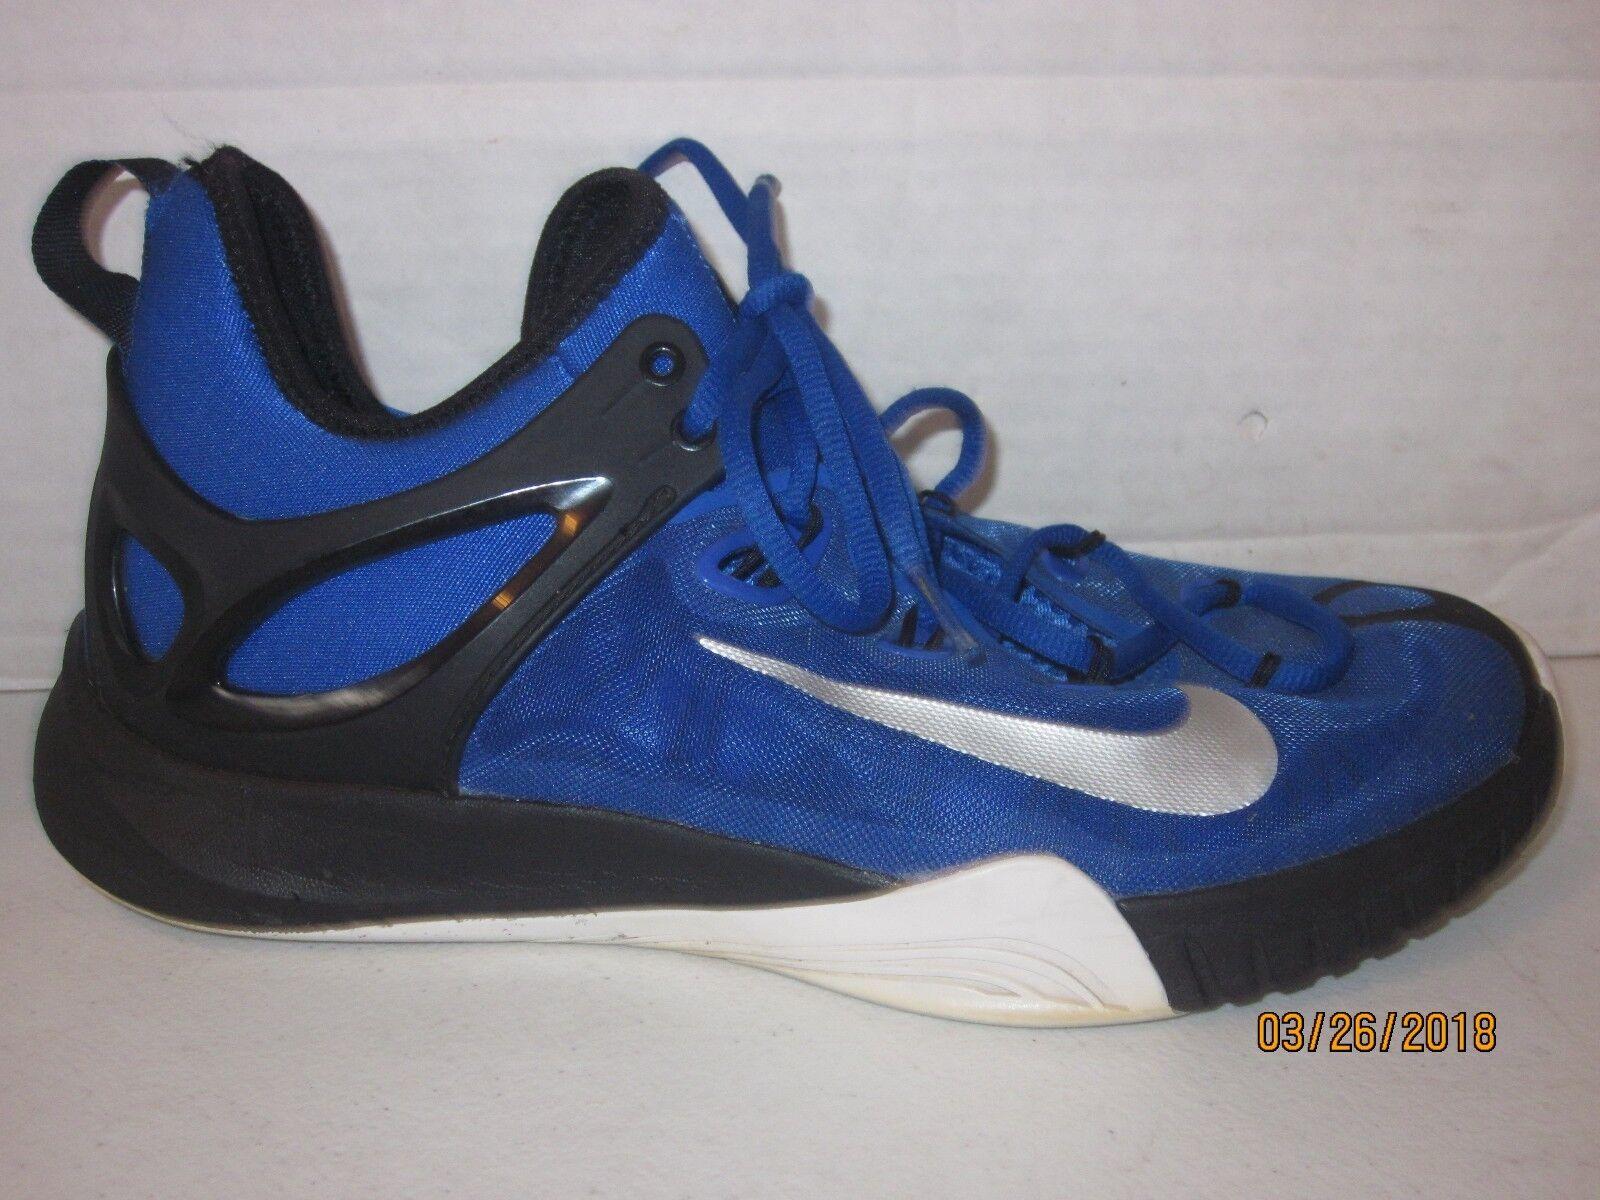 NIKE ZOOM HYPERREV 2014 ROYAL blueE MEN'S BASKETBALL SHOES 705370-400 SIZE 9 j28